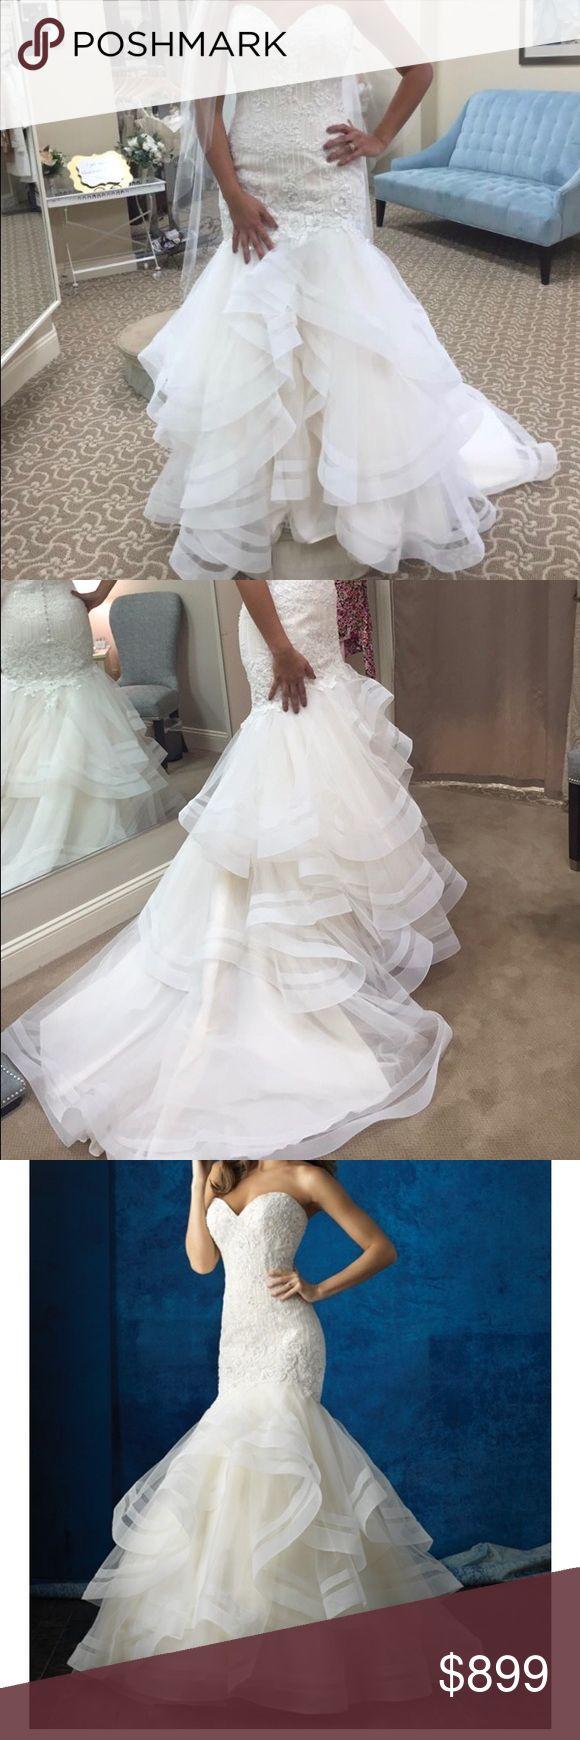 Selling this Allure Bridal wedding dress on Poshmark! My username is: itsxomel. #shopmycloset #poshmark #fashion #shopping #style #forsale #allure bridals #Dresses & Skirts